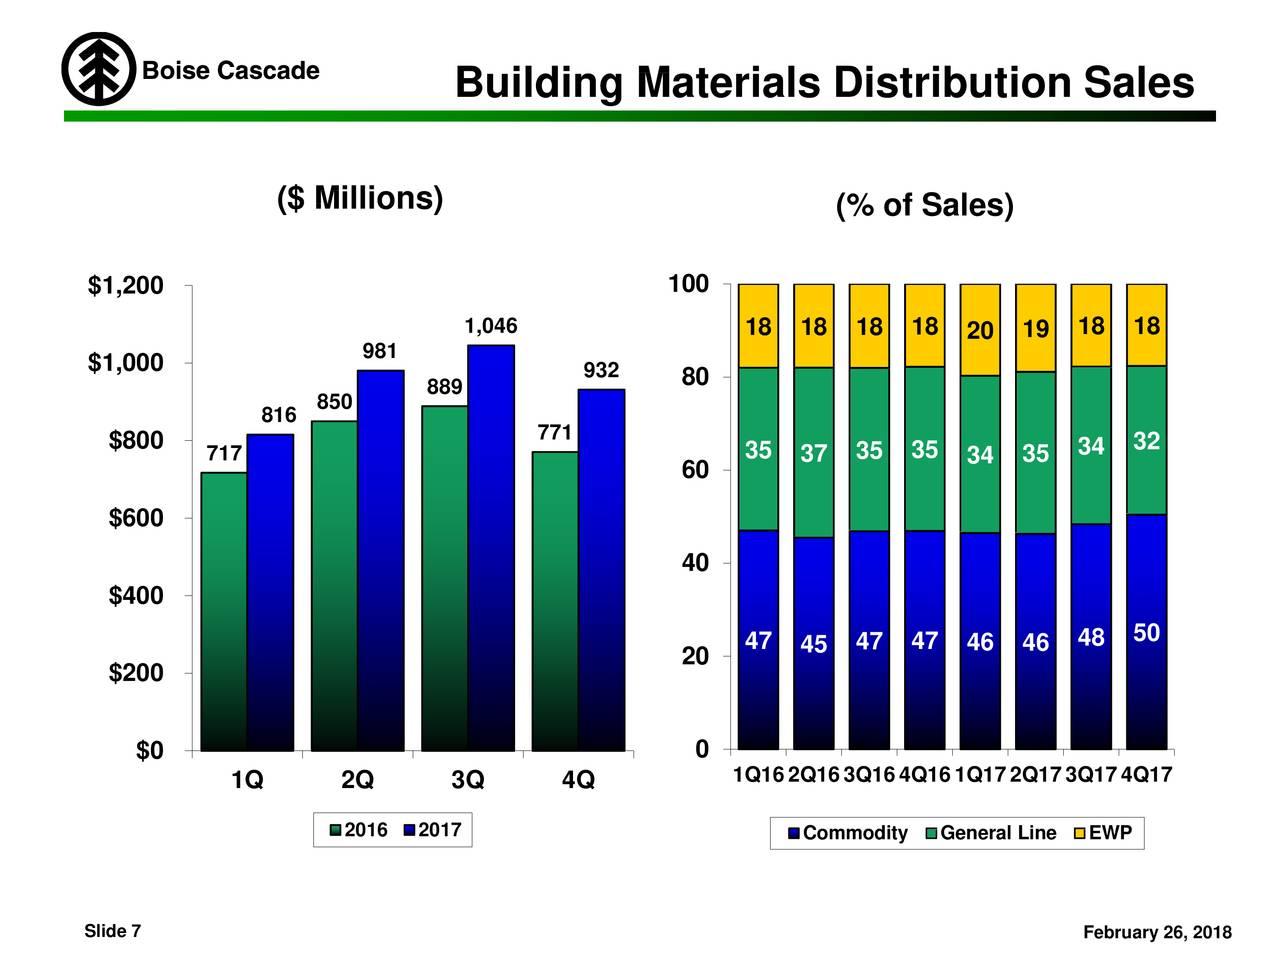 Boise Cascade Building Materials Distribution